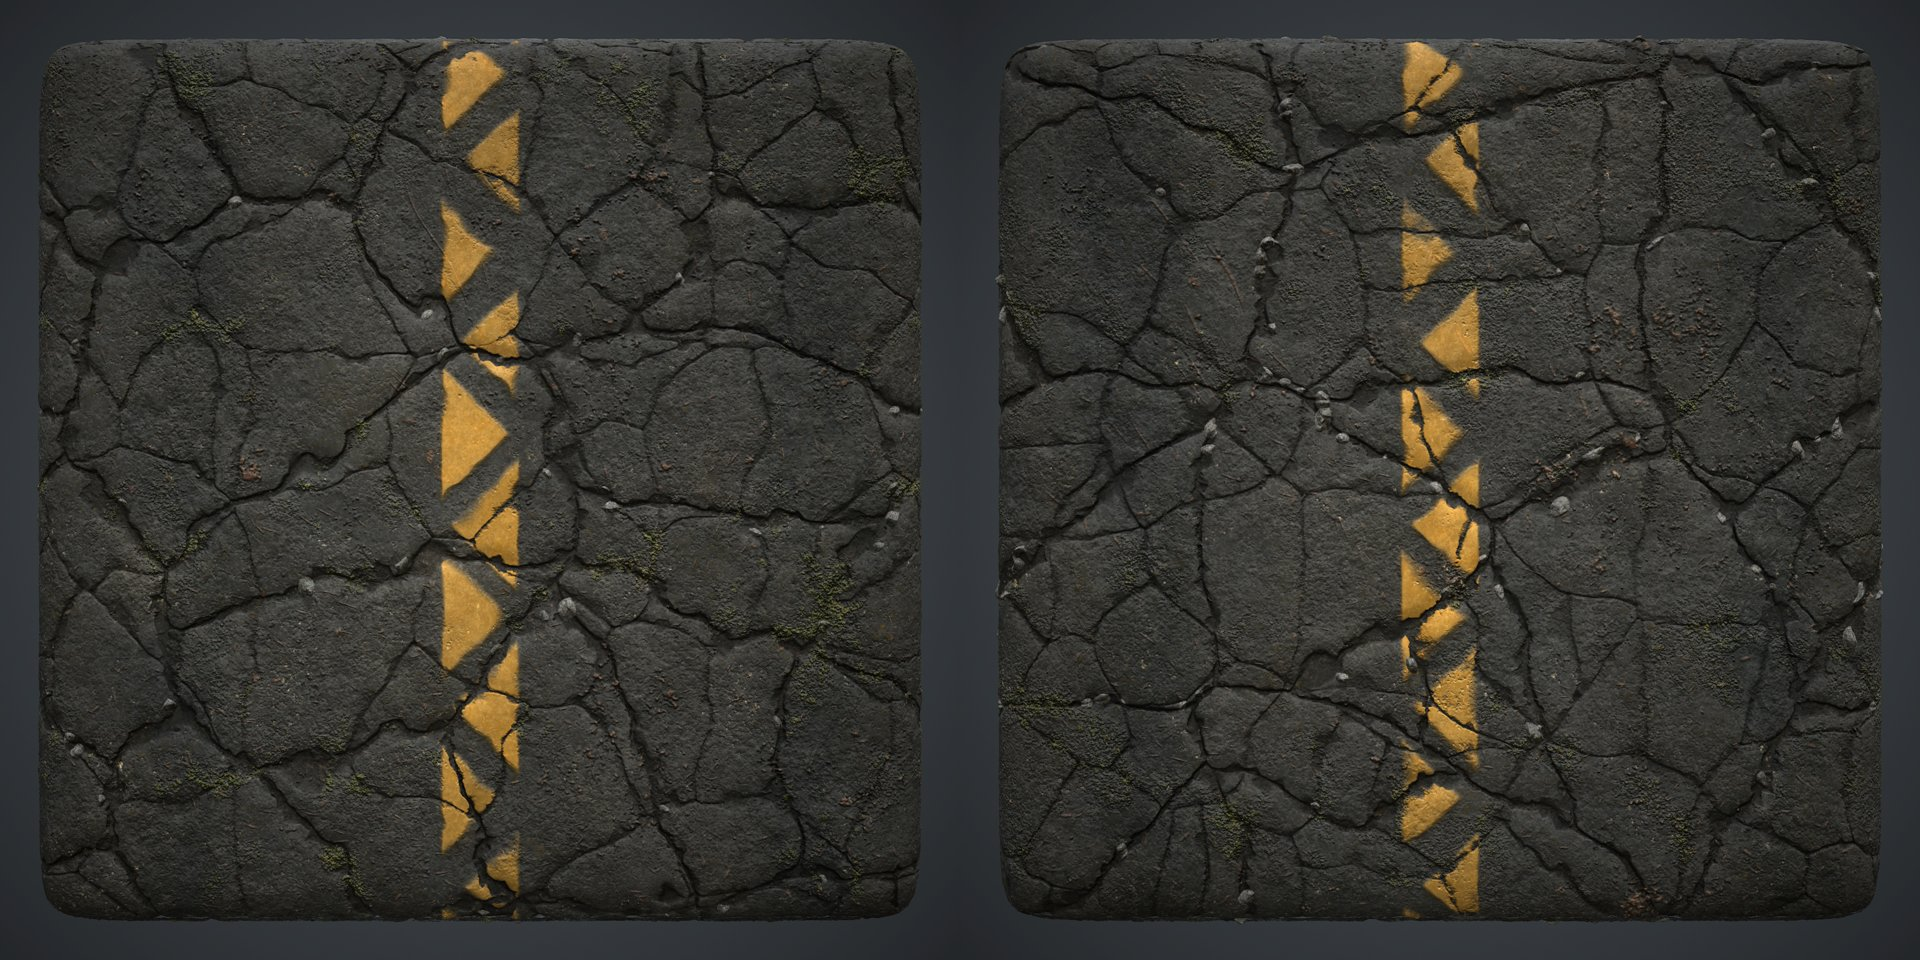 chaumette-adnan-final-render-2.jpg?1440856630